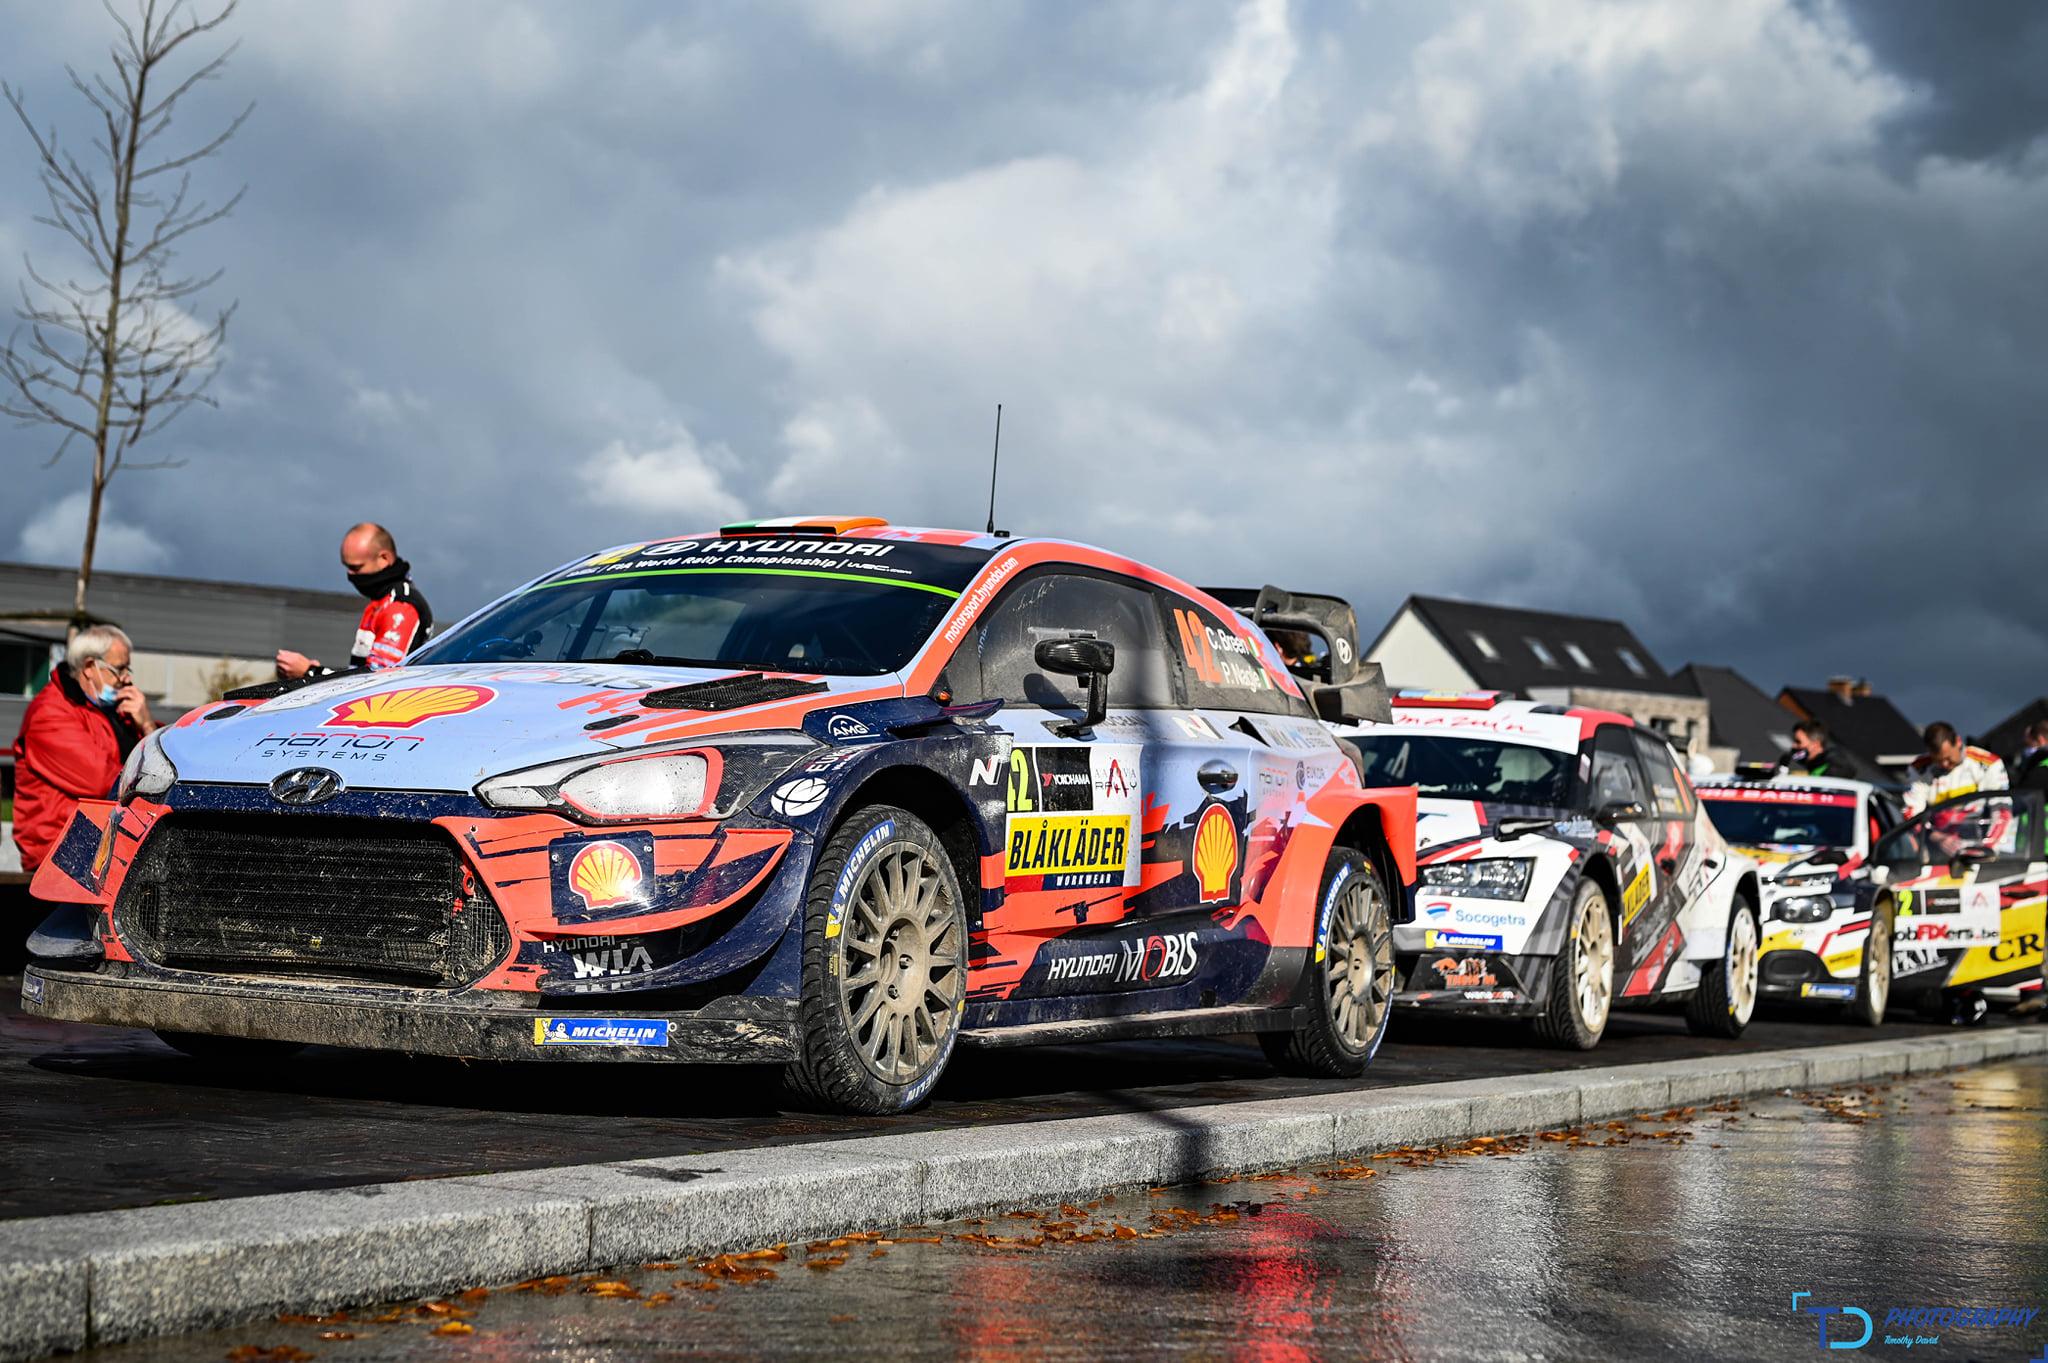 South Belgian Rally 2020